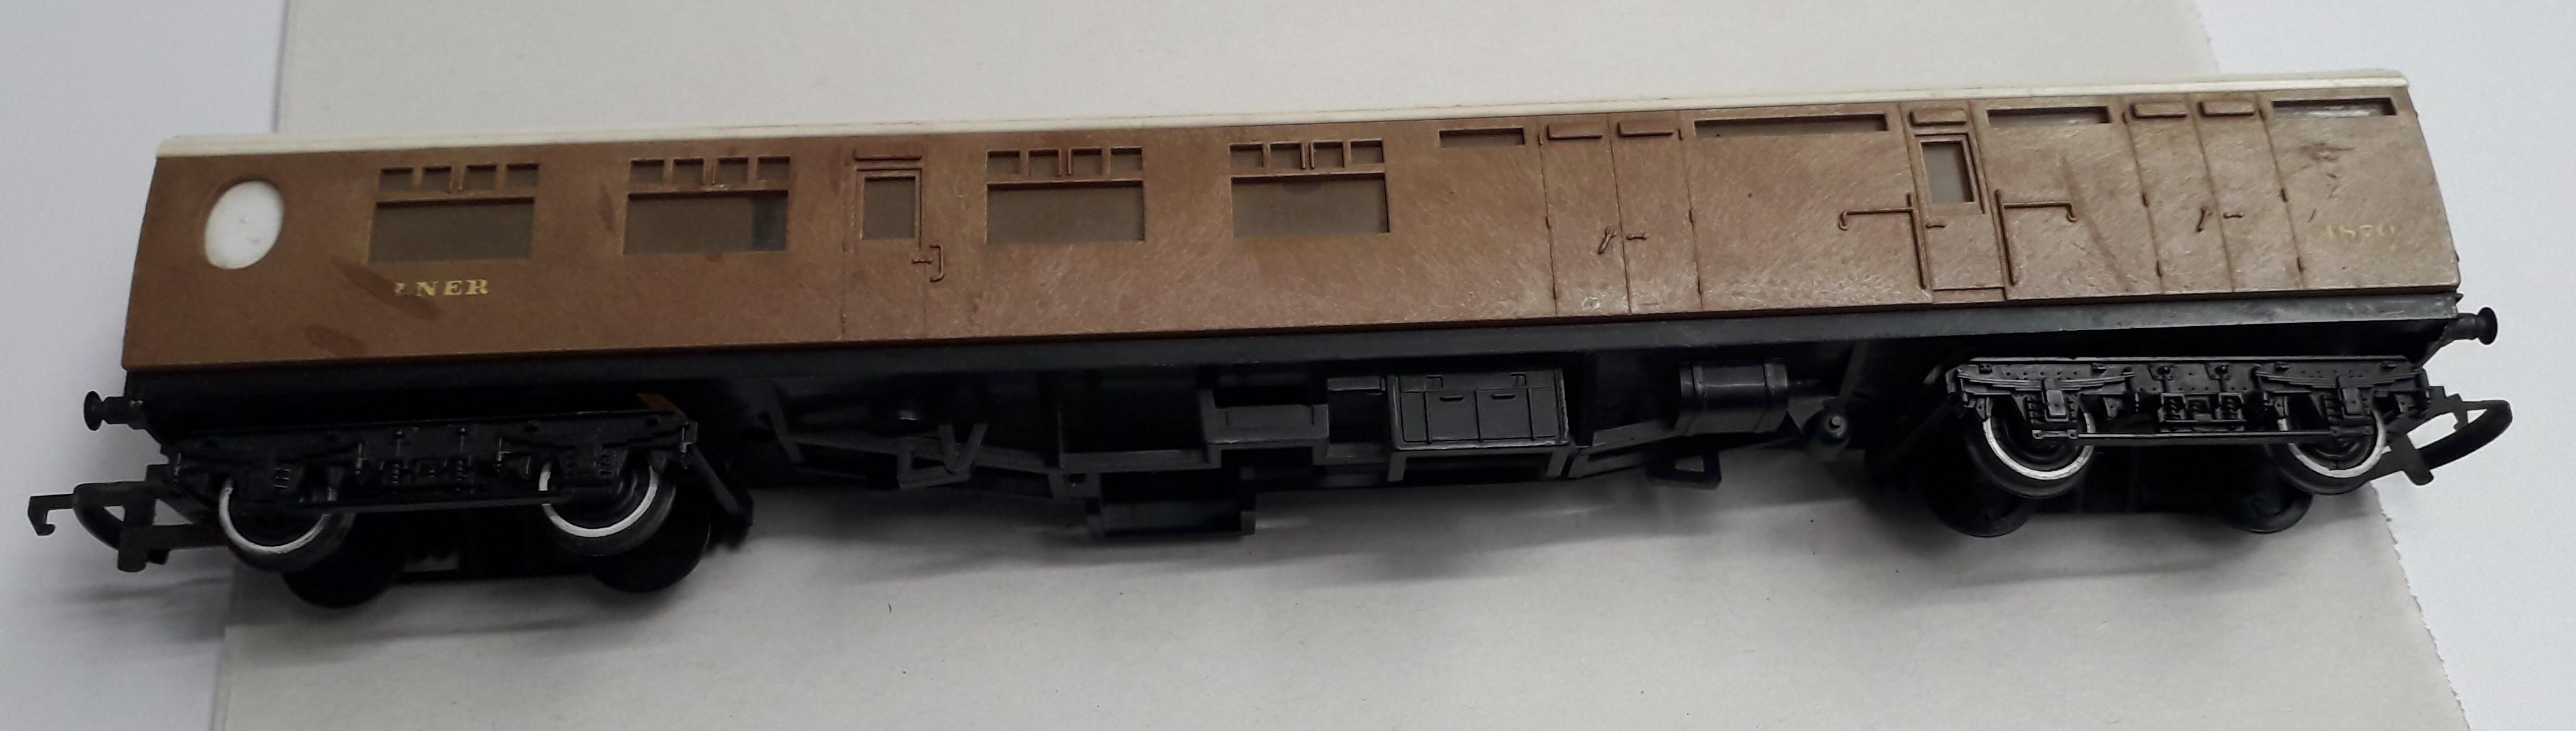 R746 Triang-Hornby LNER Thompson Brake End Coach 1870